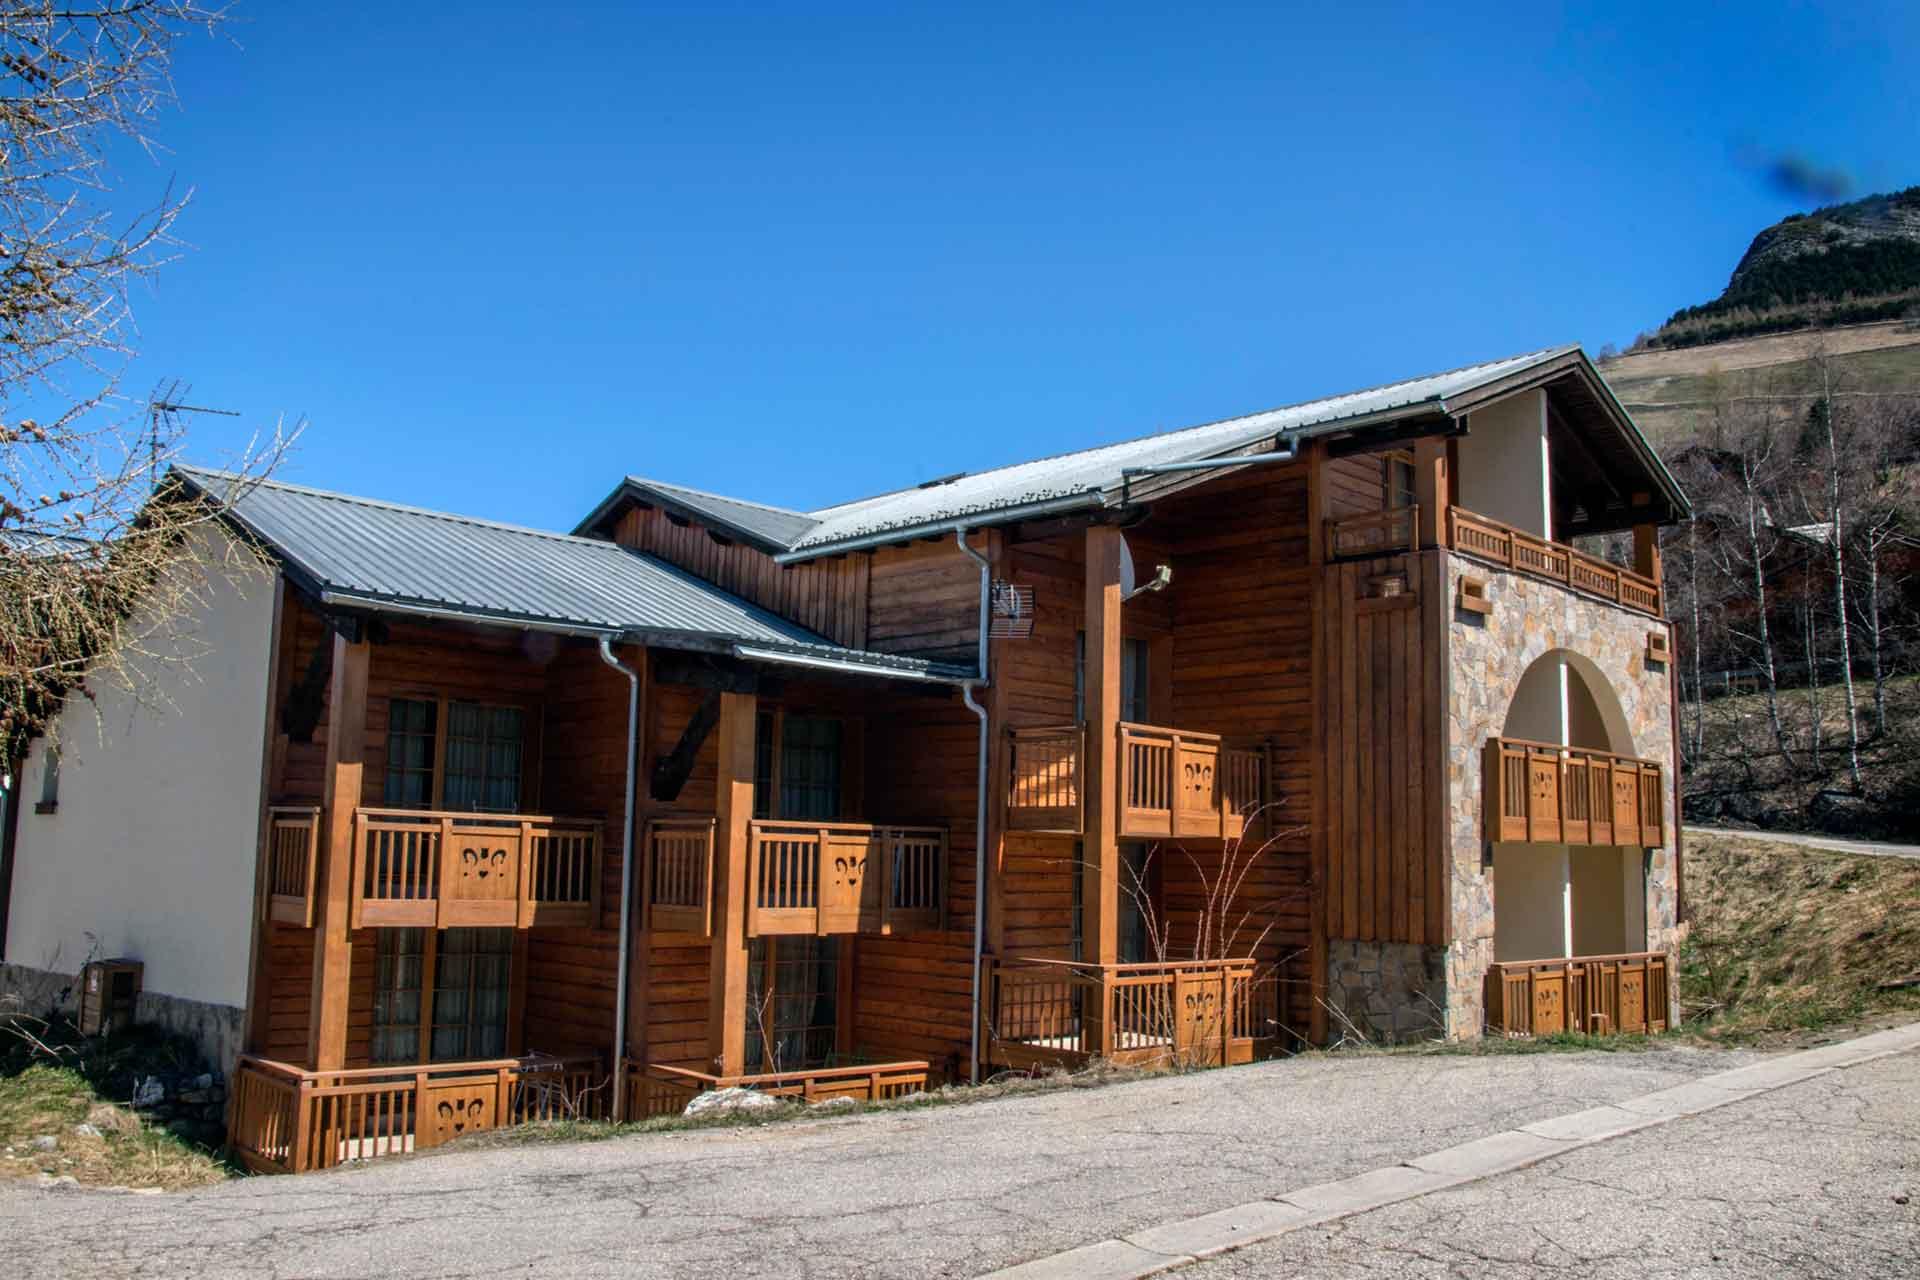 MoreStyleChalet - Les 2 Alpes - Esterno Chalet